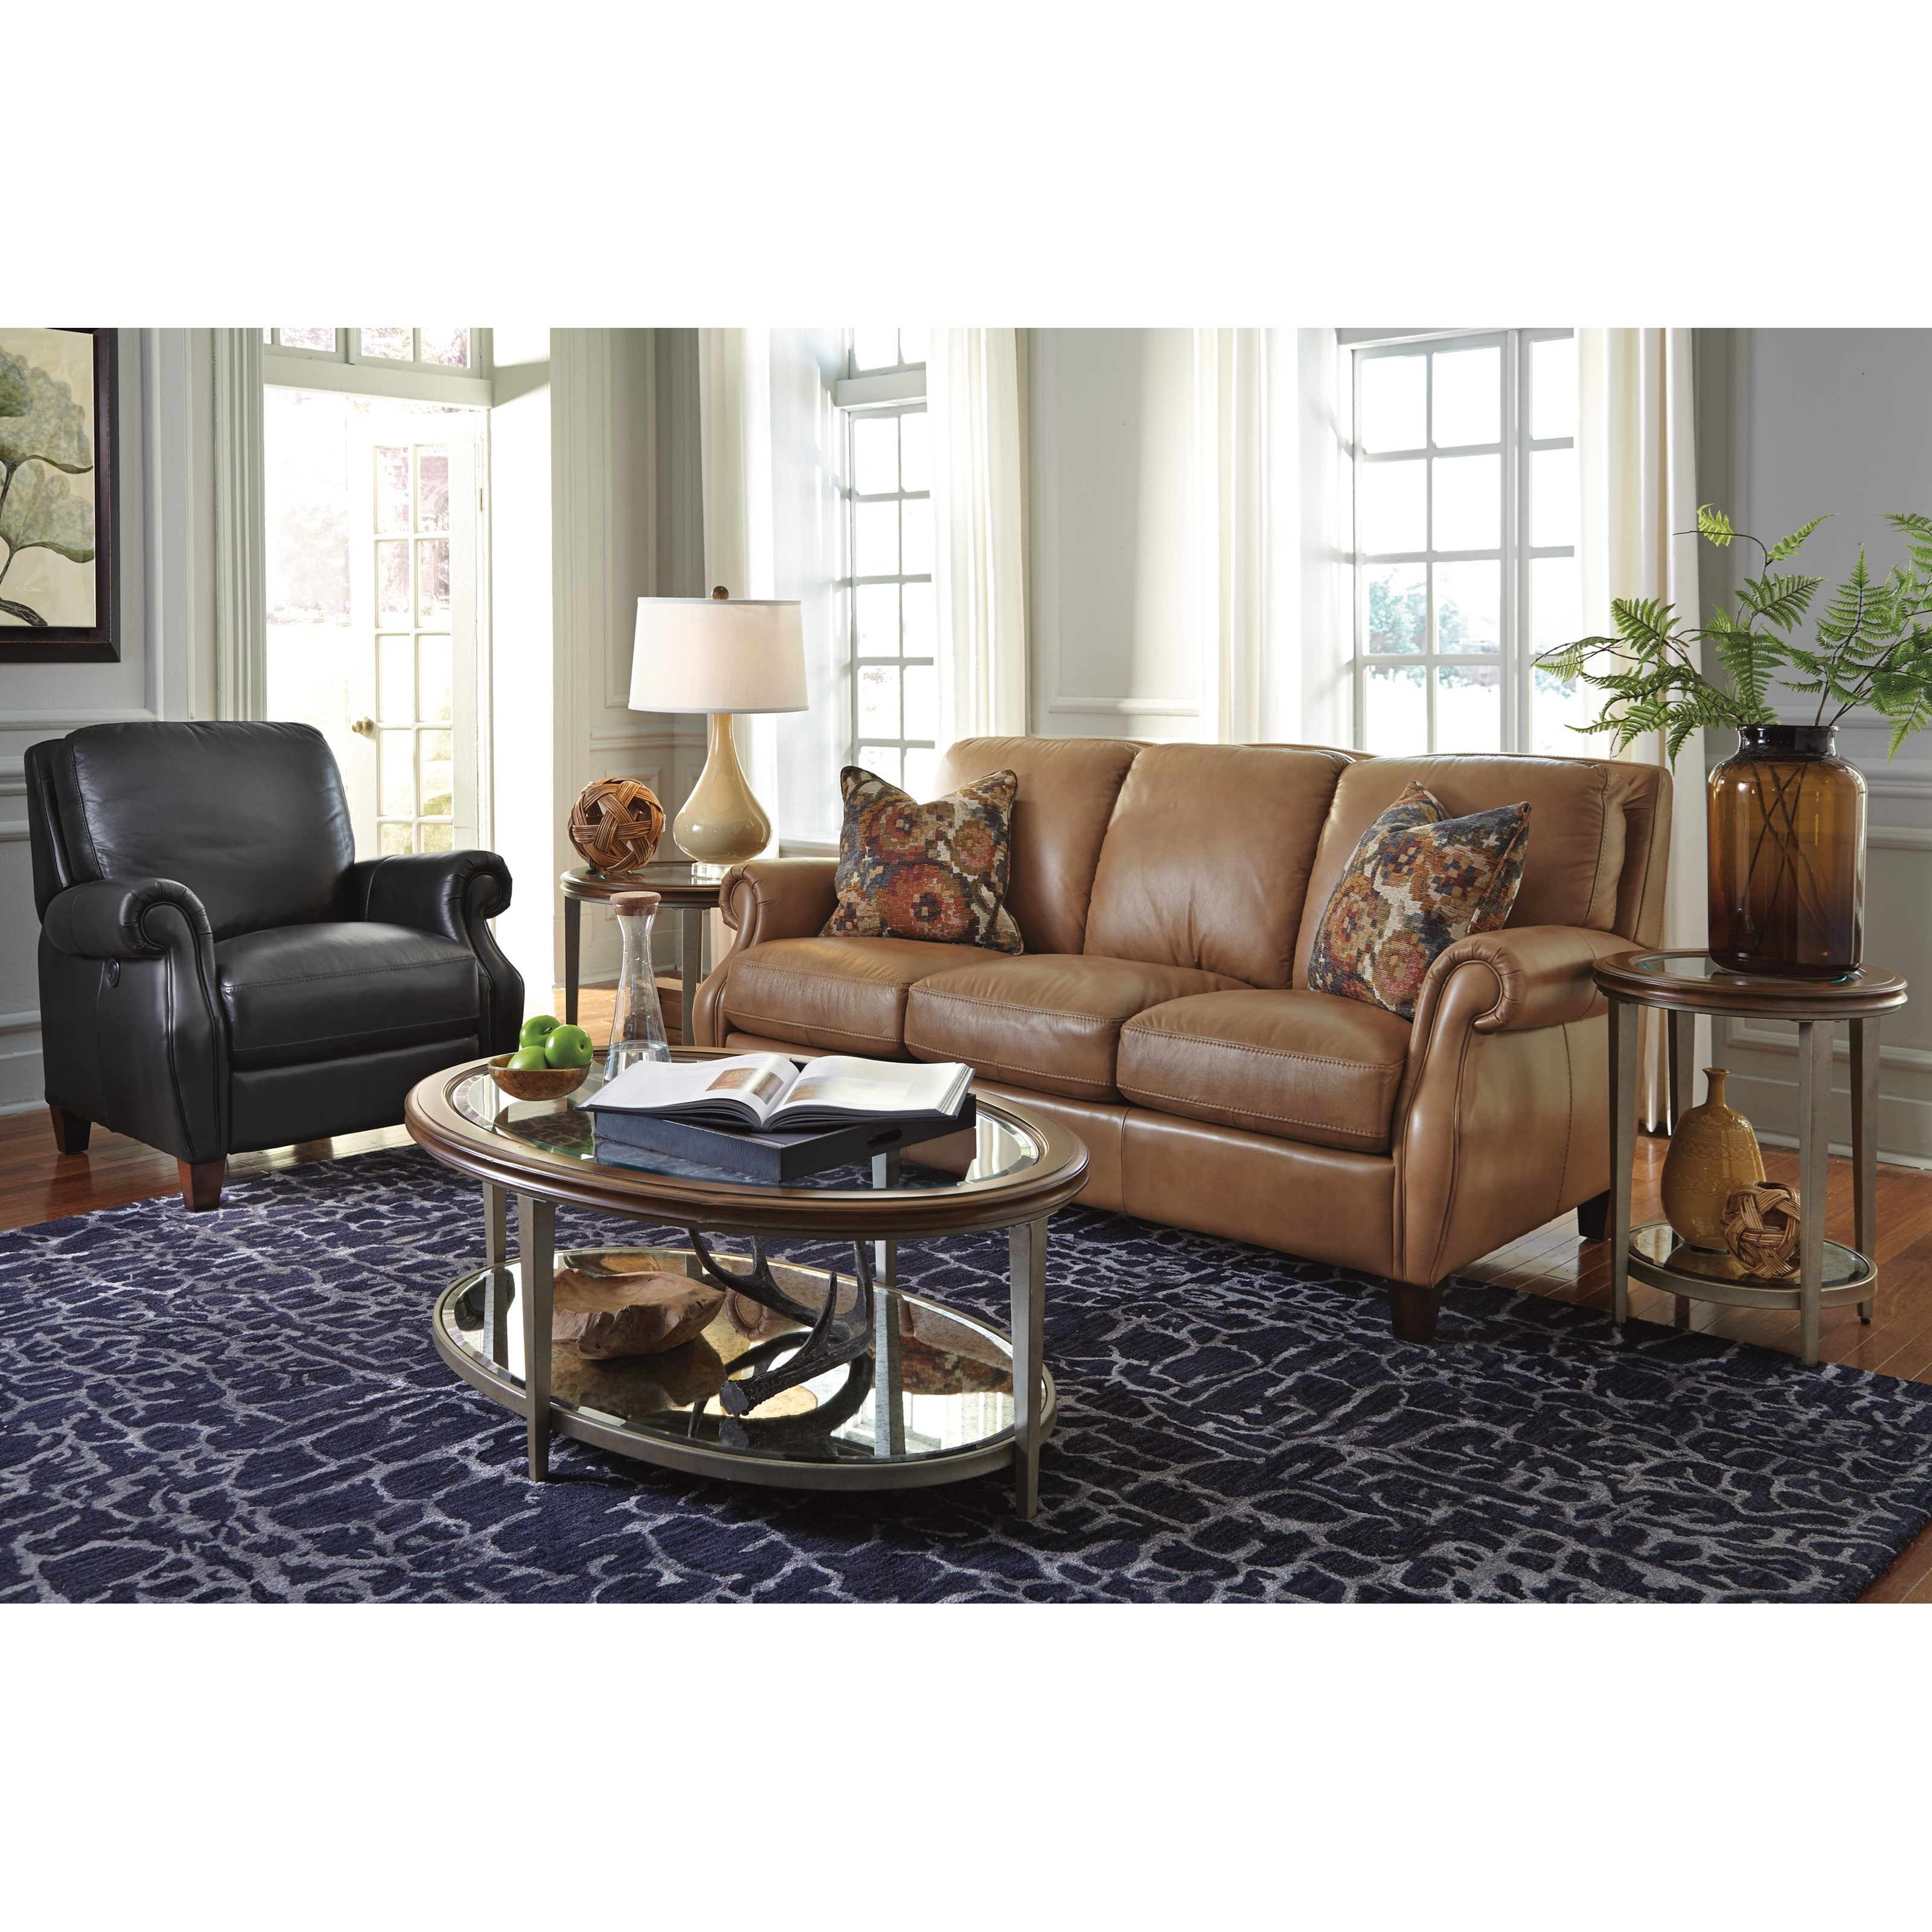 Flexsteel Latitudes-Exton Living Room Group - Item Number: 1383 Living Room Group 1